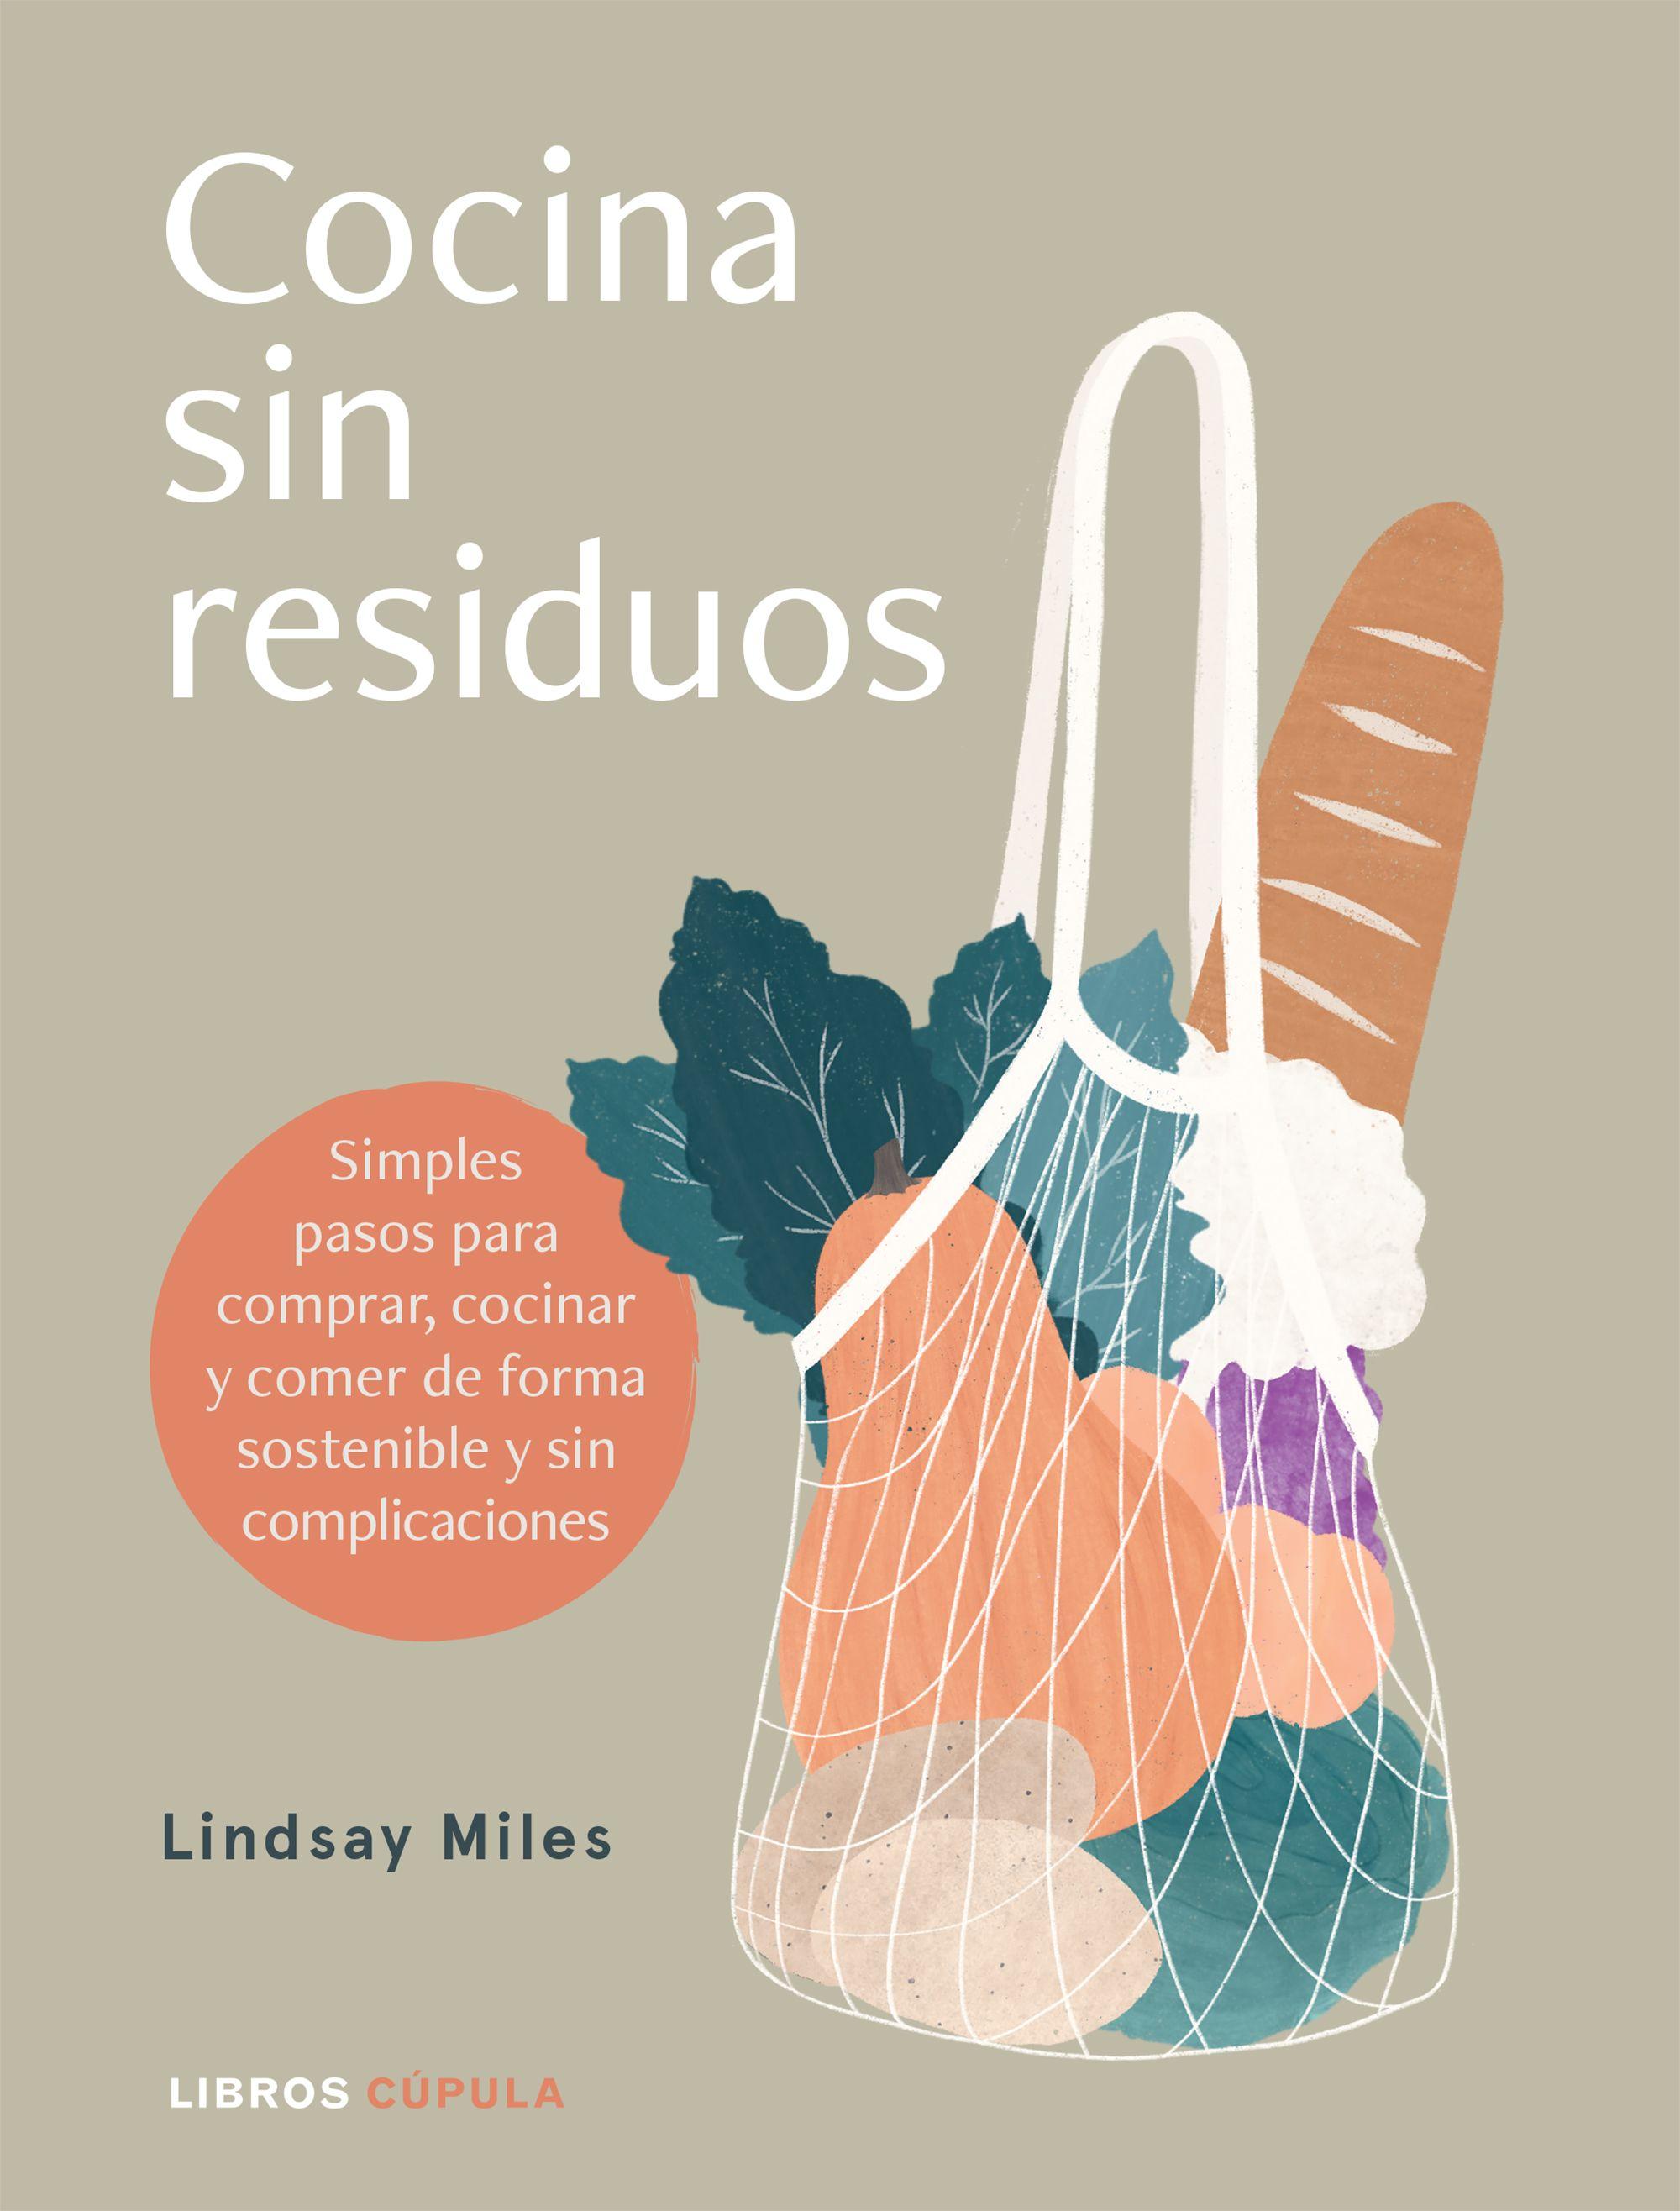 cocina-sin-residuos_lindsay-miles